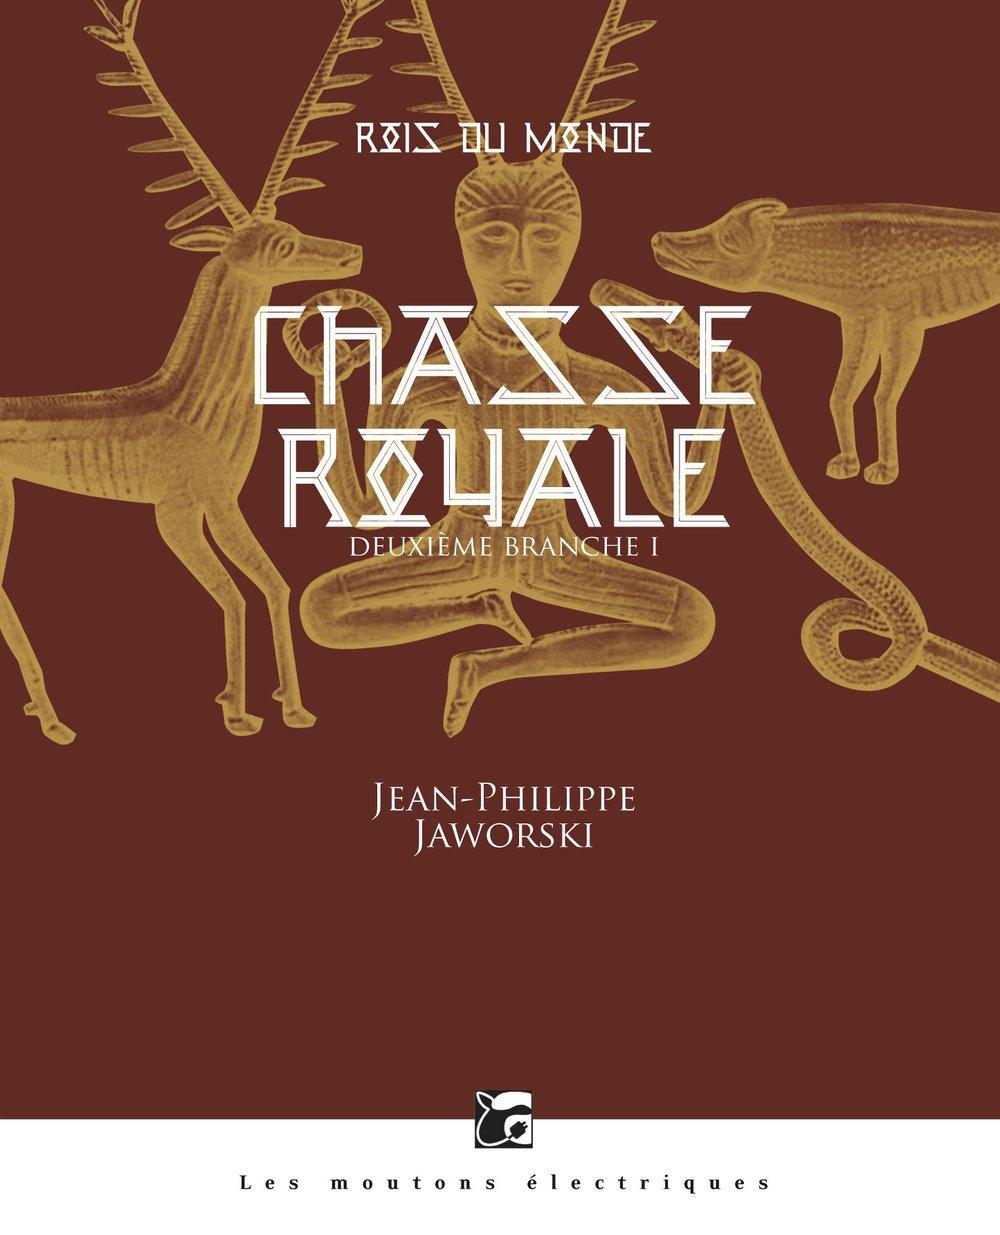 Rois du monde, Tome 2 : Chasse royale de Jean-Philippe Jaworski